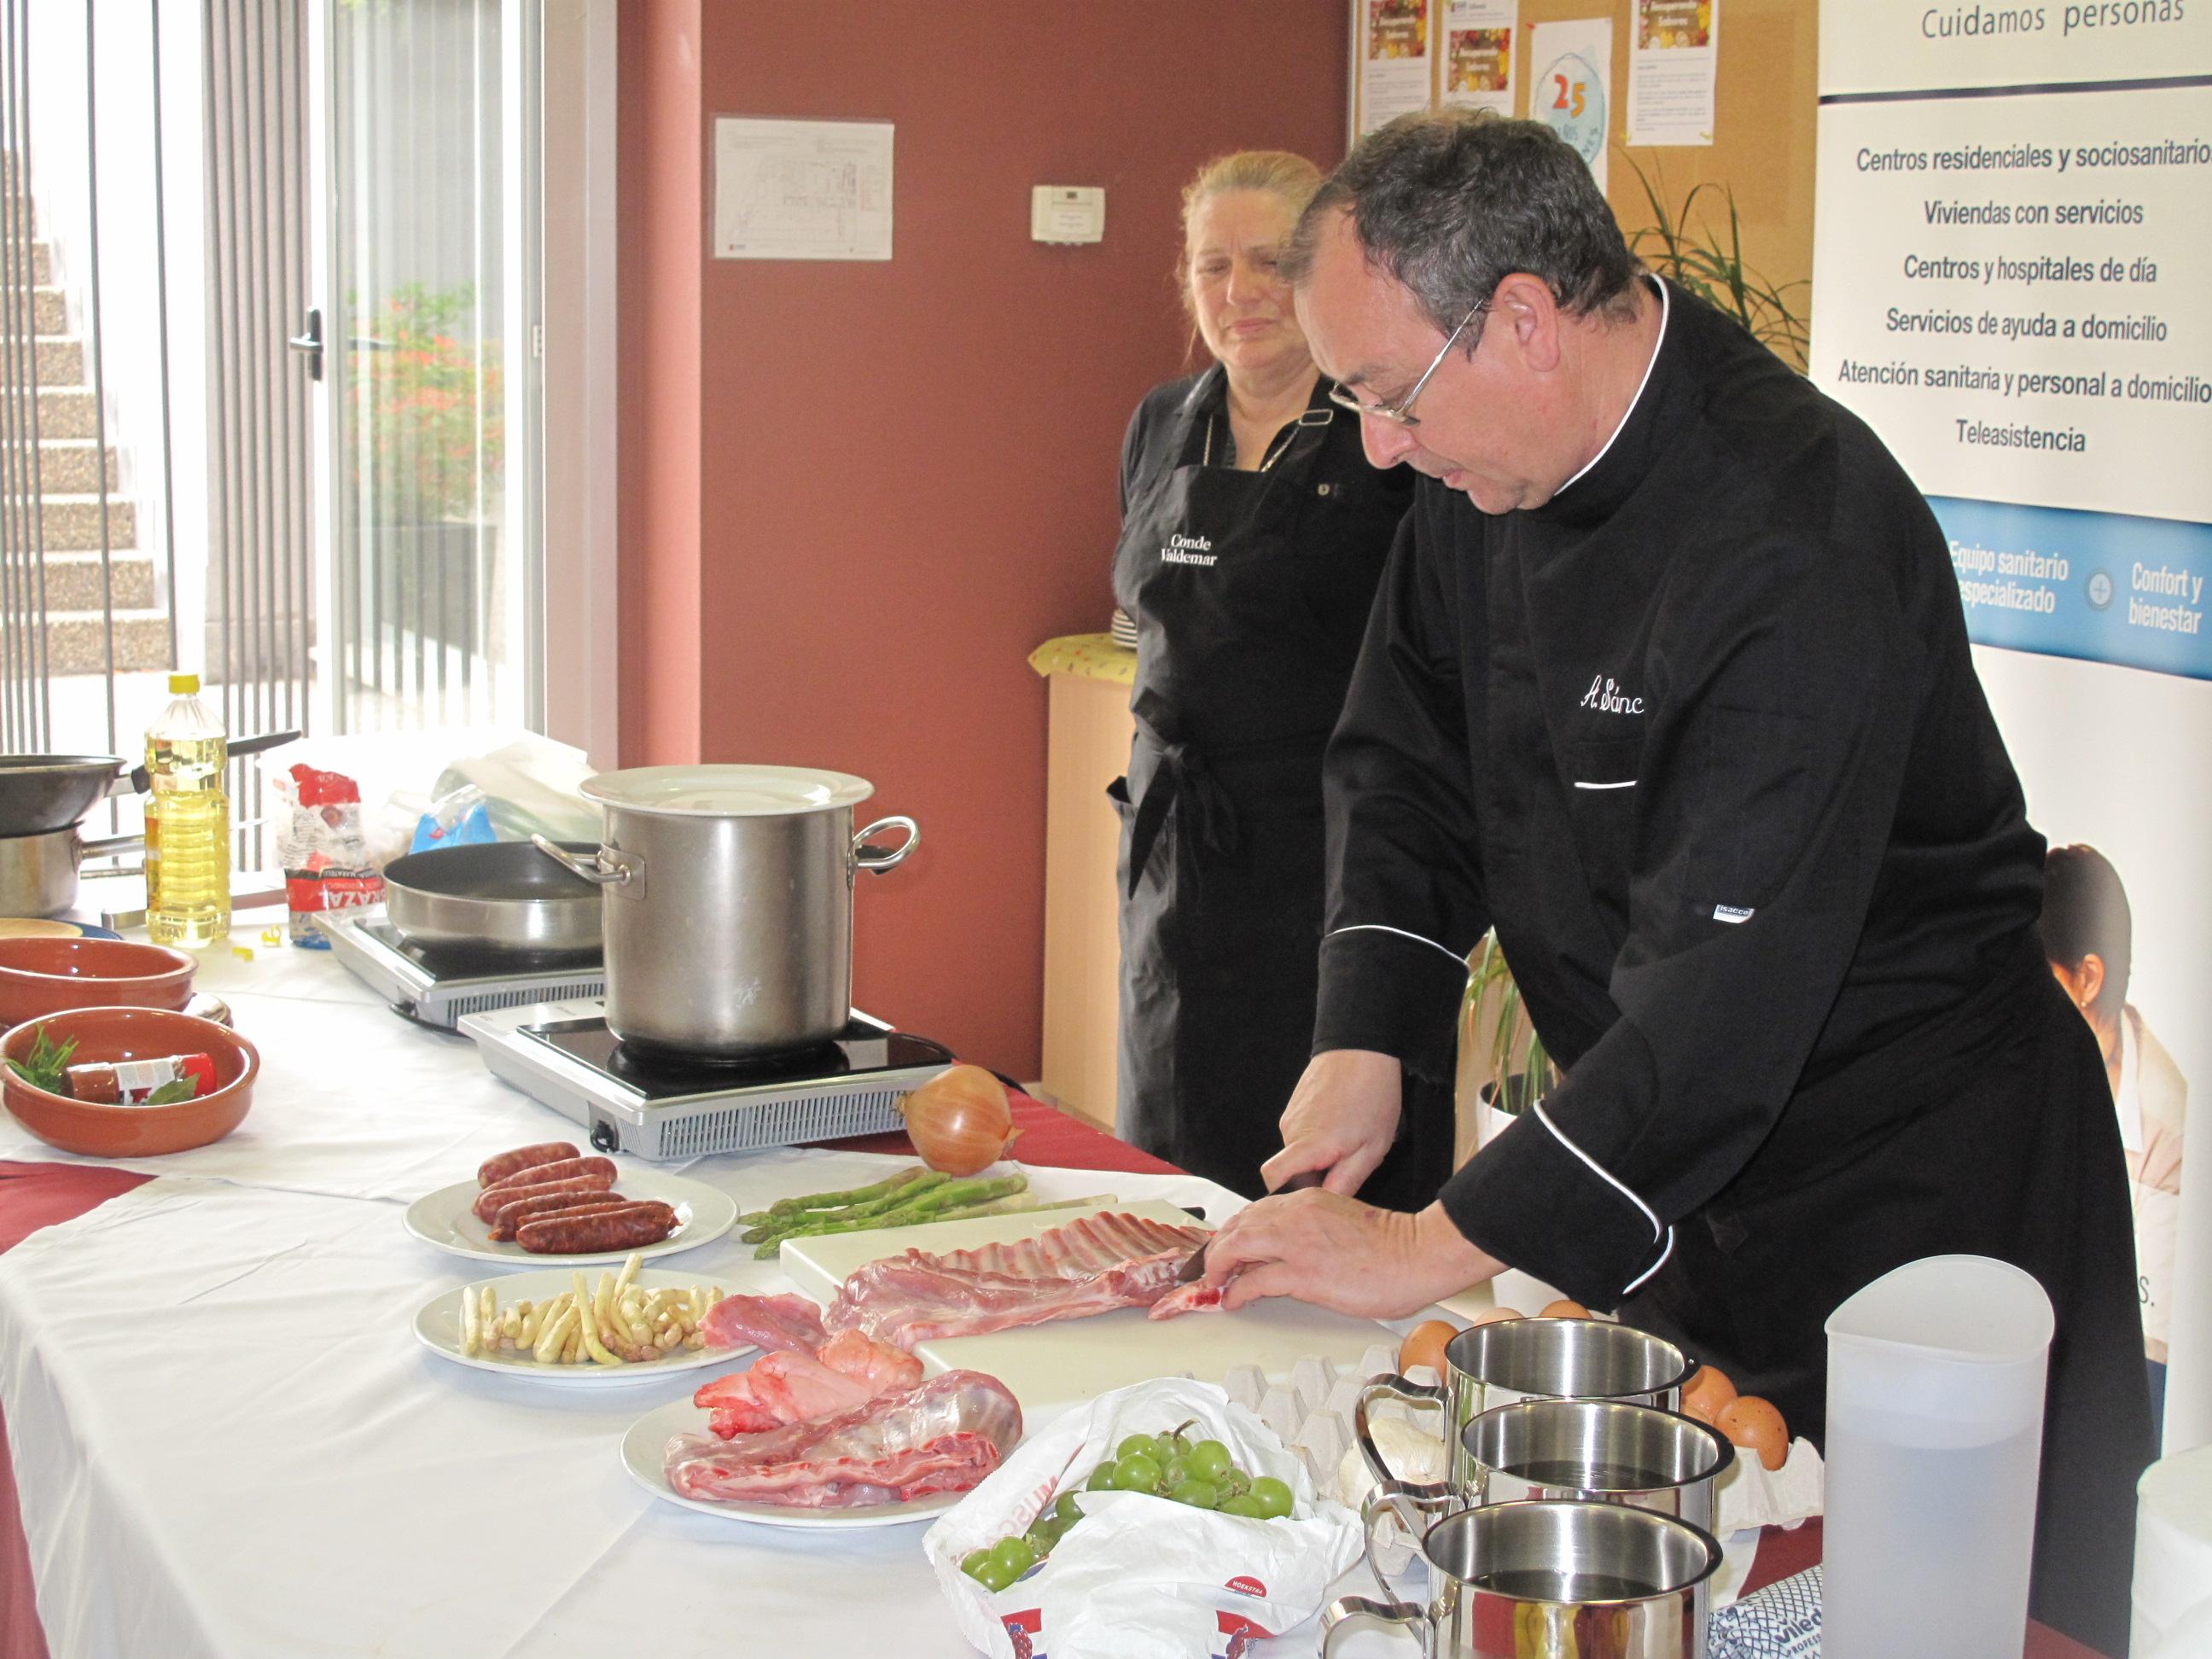 160330 Zalfonada show cooking (2)